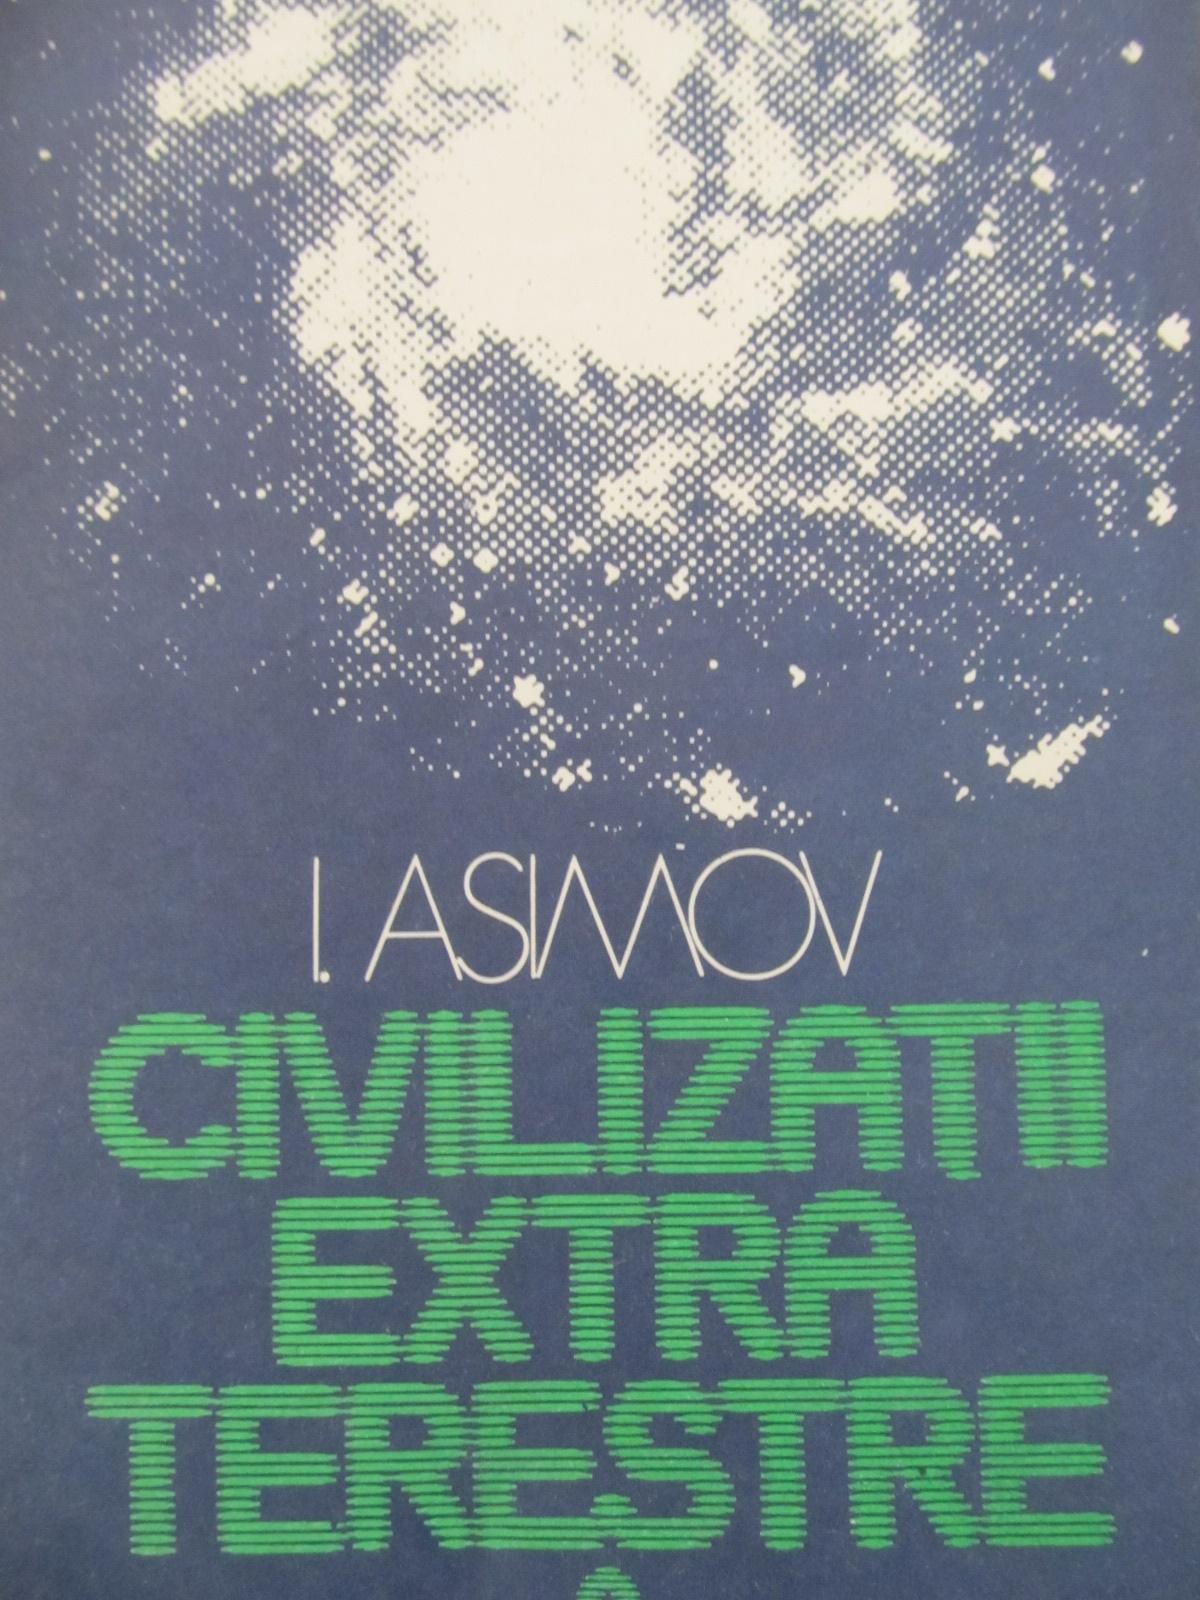 Civilizatii extraterestre - I. Asimov | Detalii carte